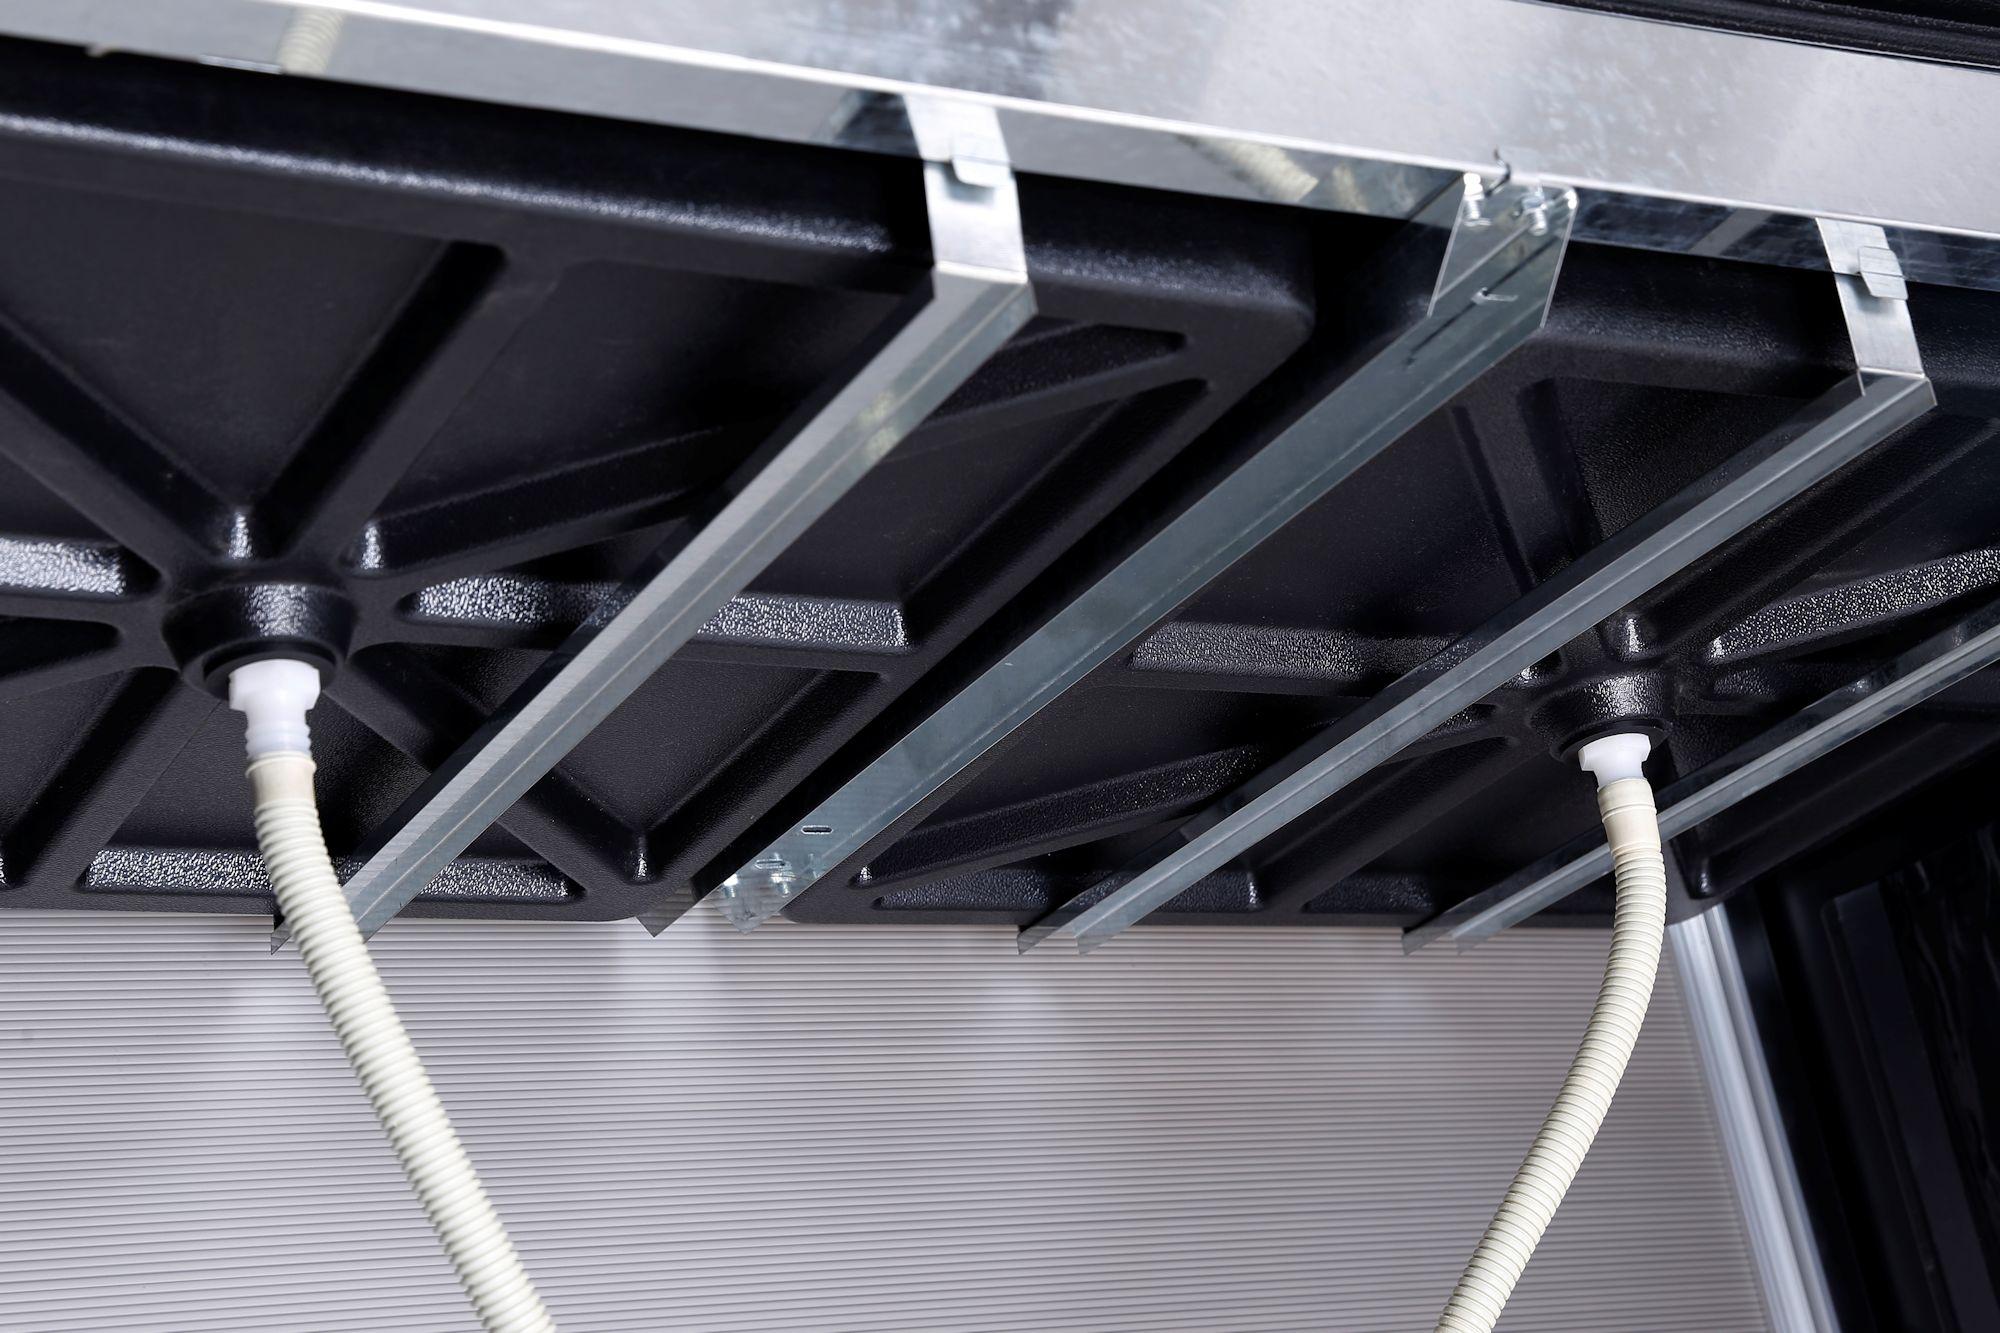 Zelsius Hochbeet Gewachshaus Aluminium Pflanzbeet Fruhbeet